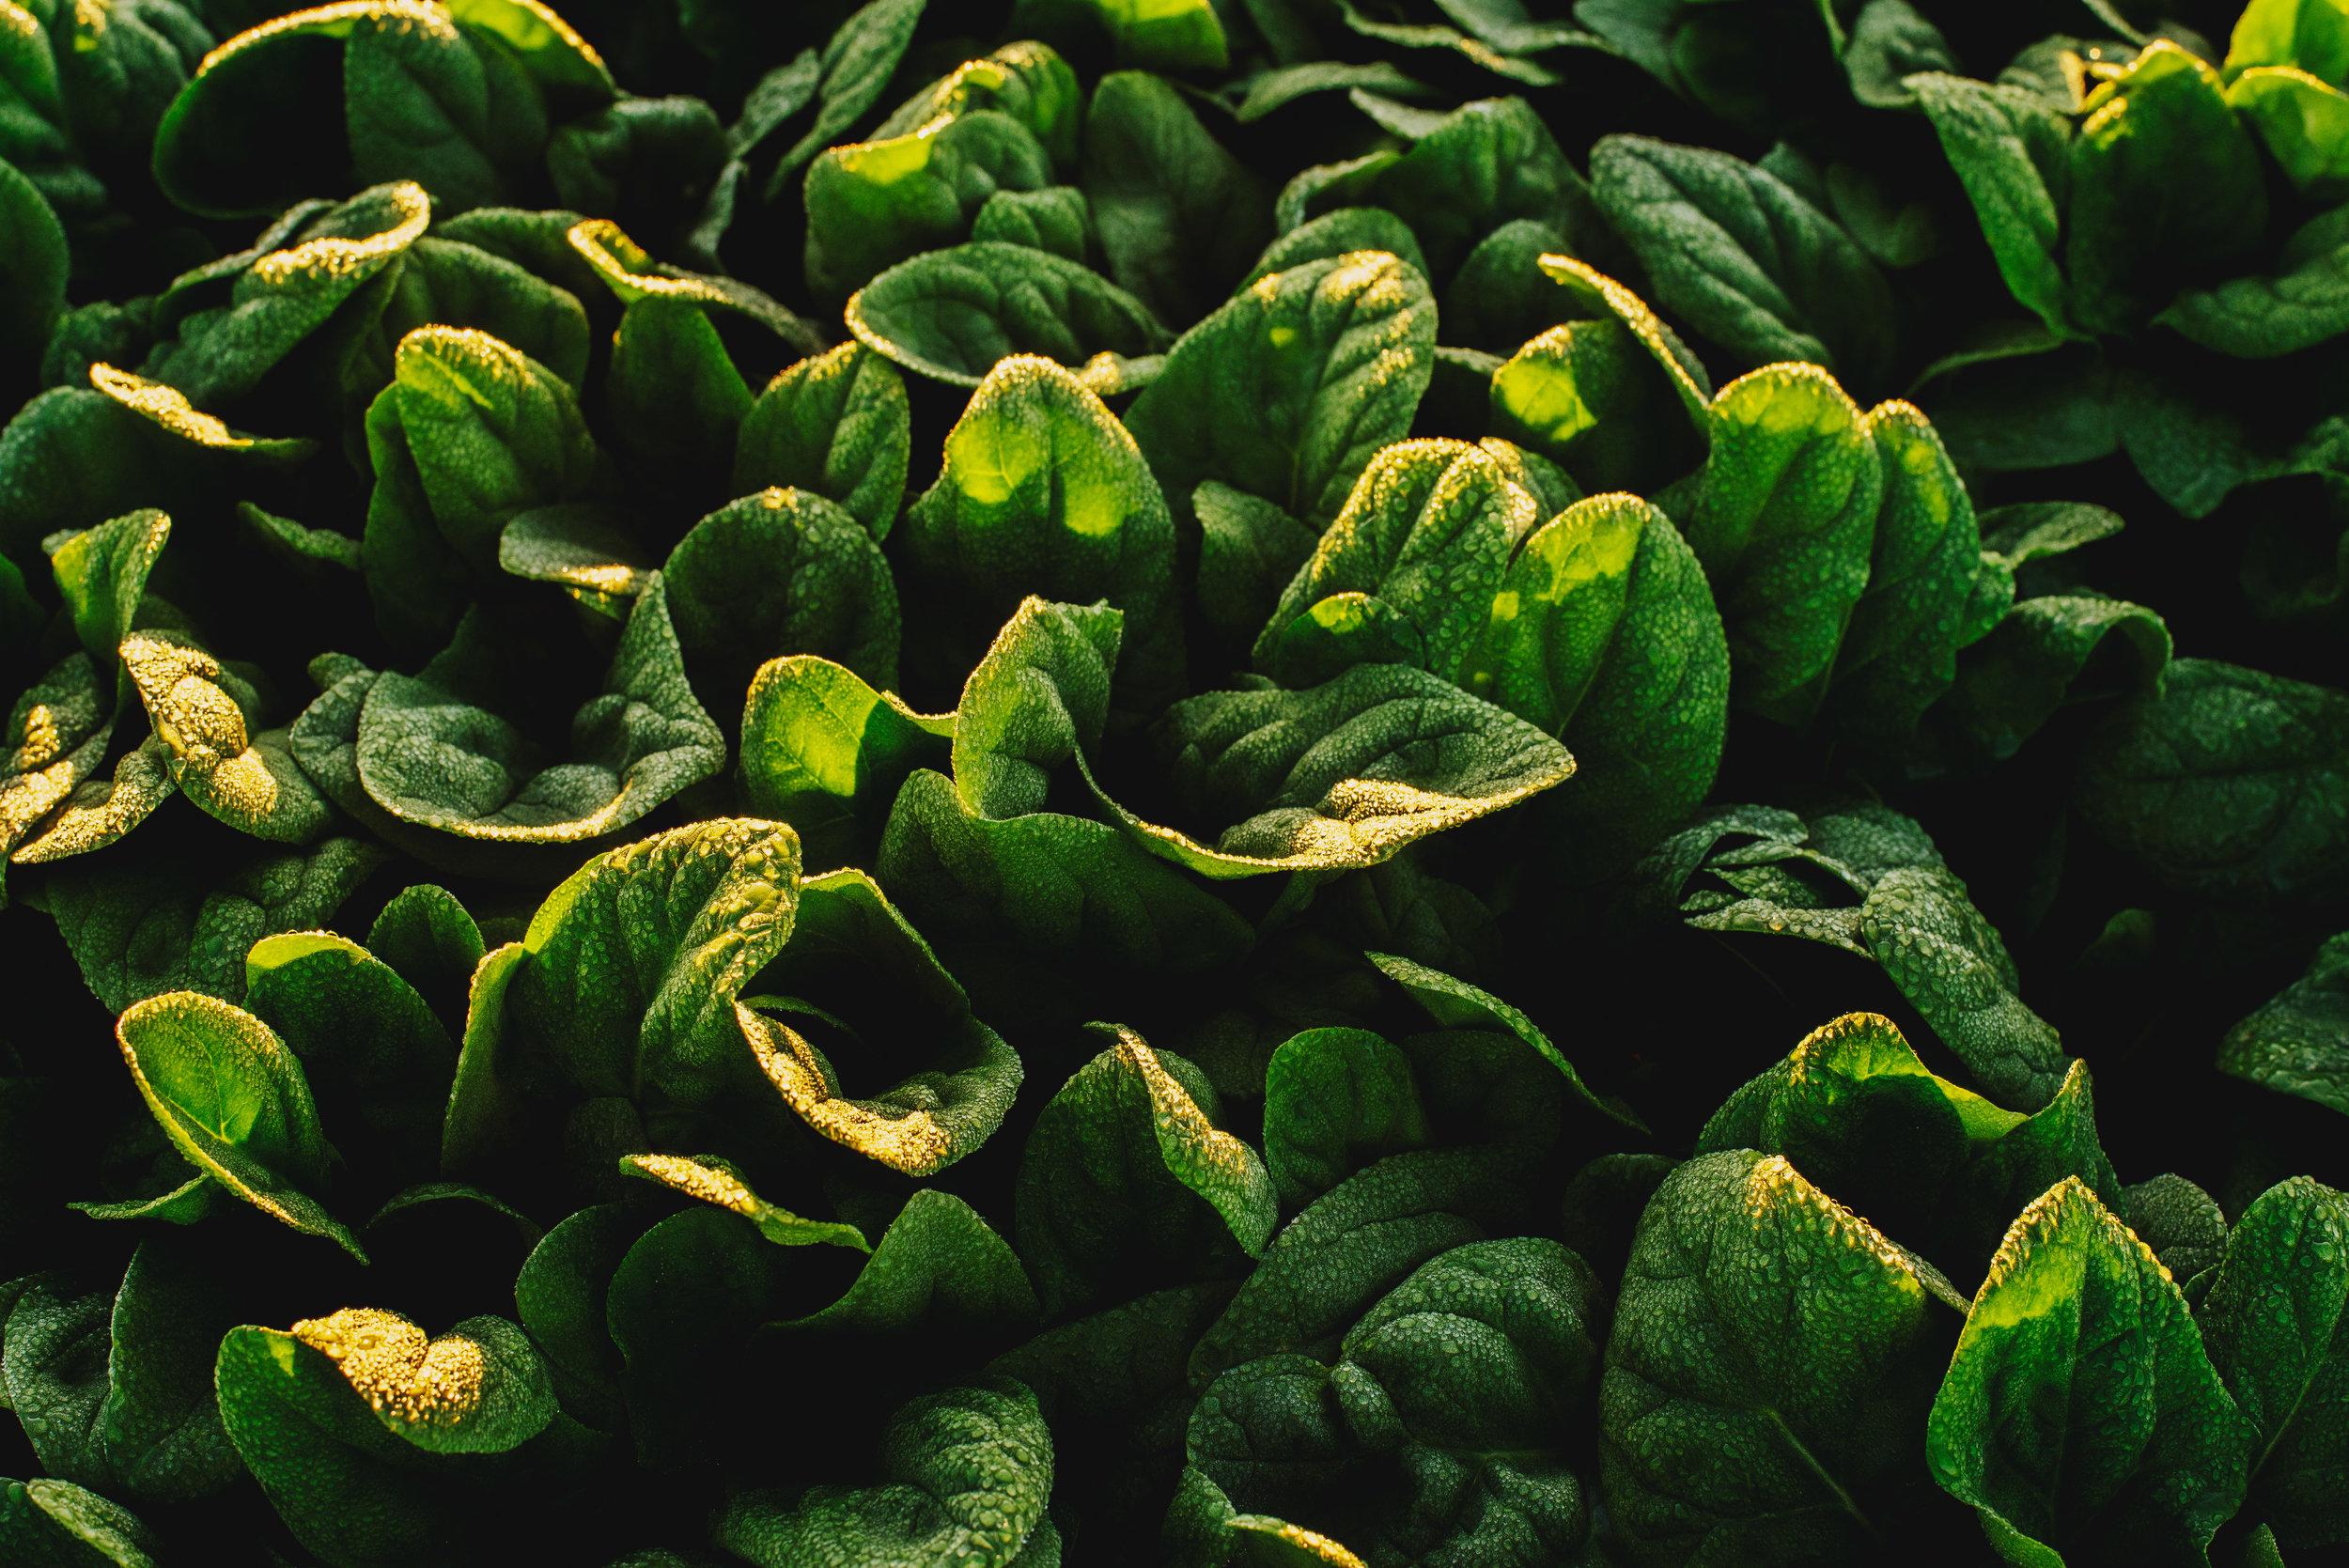 Arizona-Spinach_0038.jpg